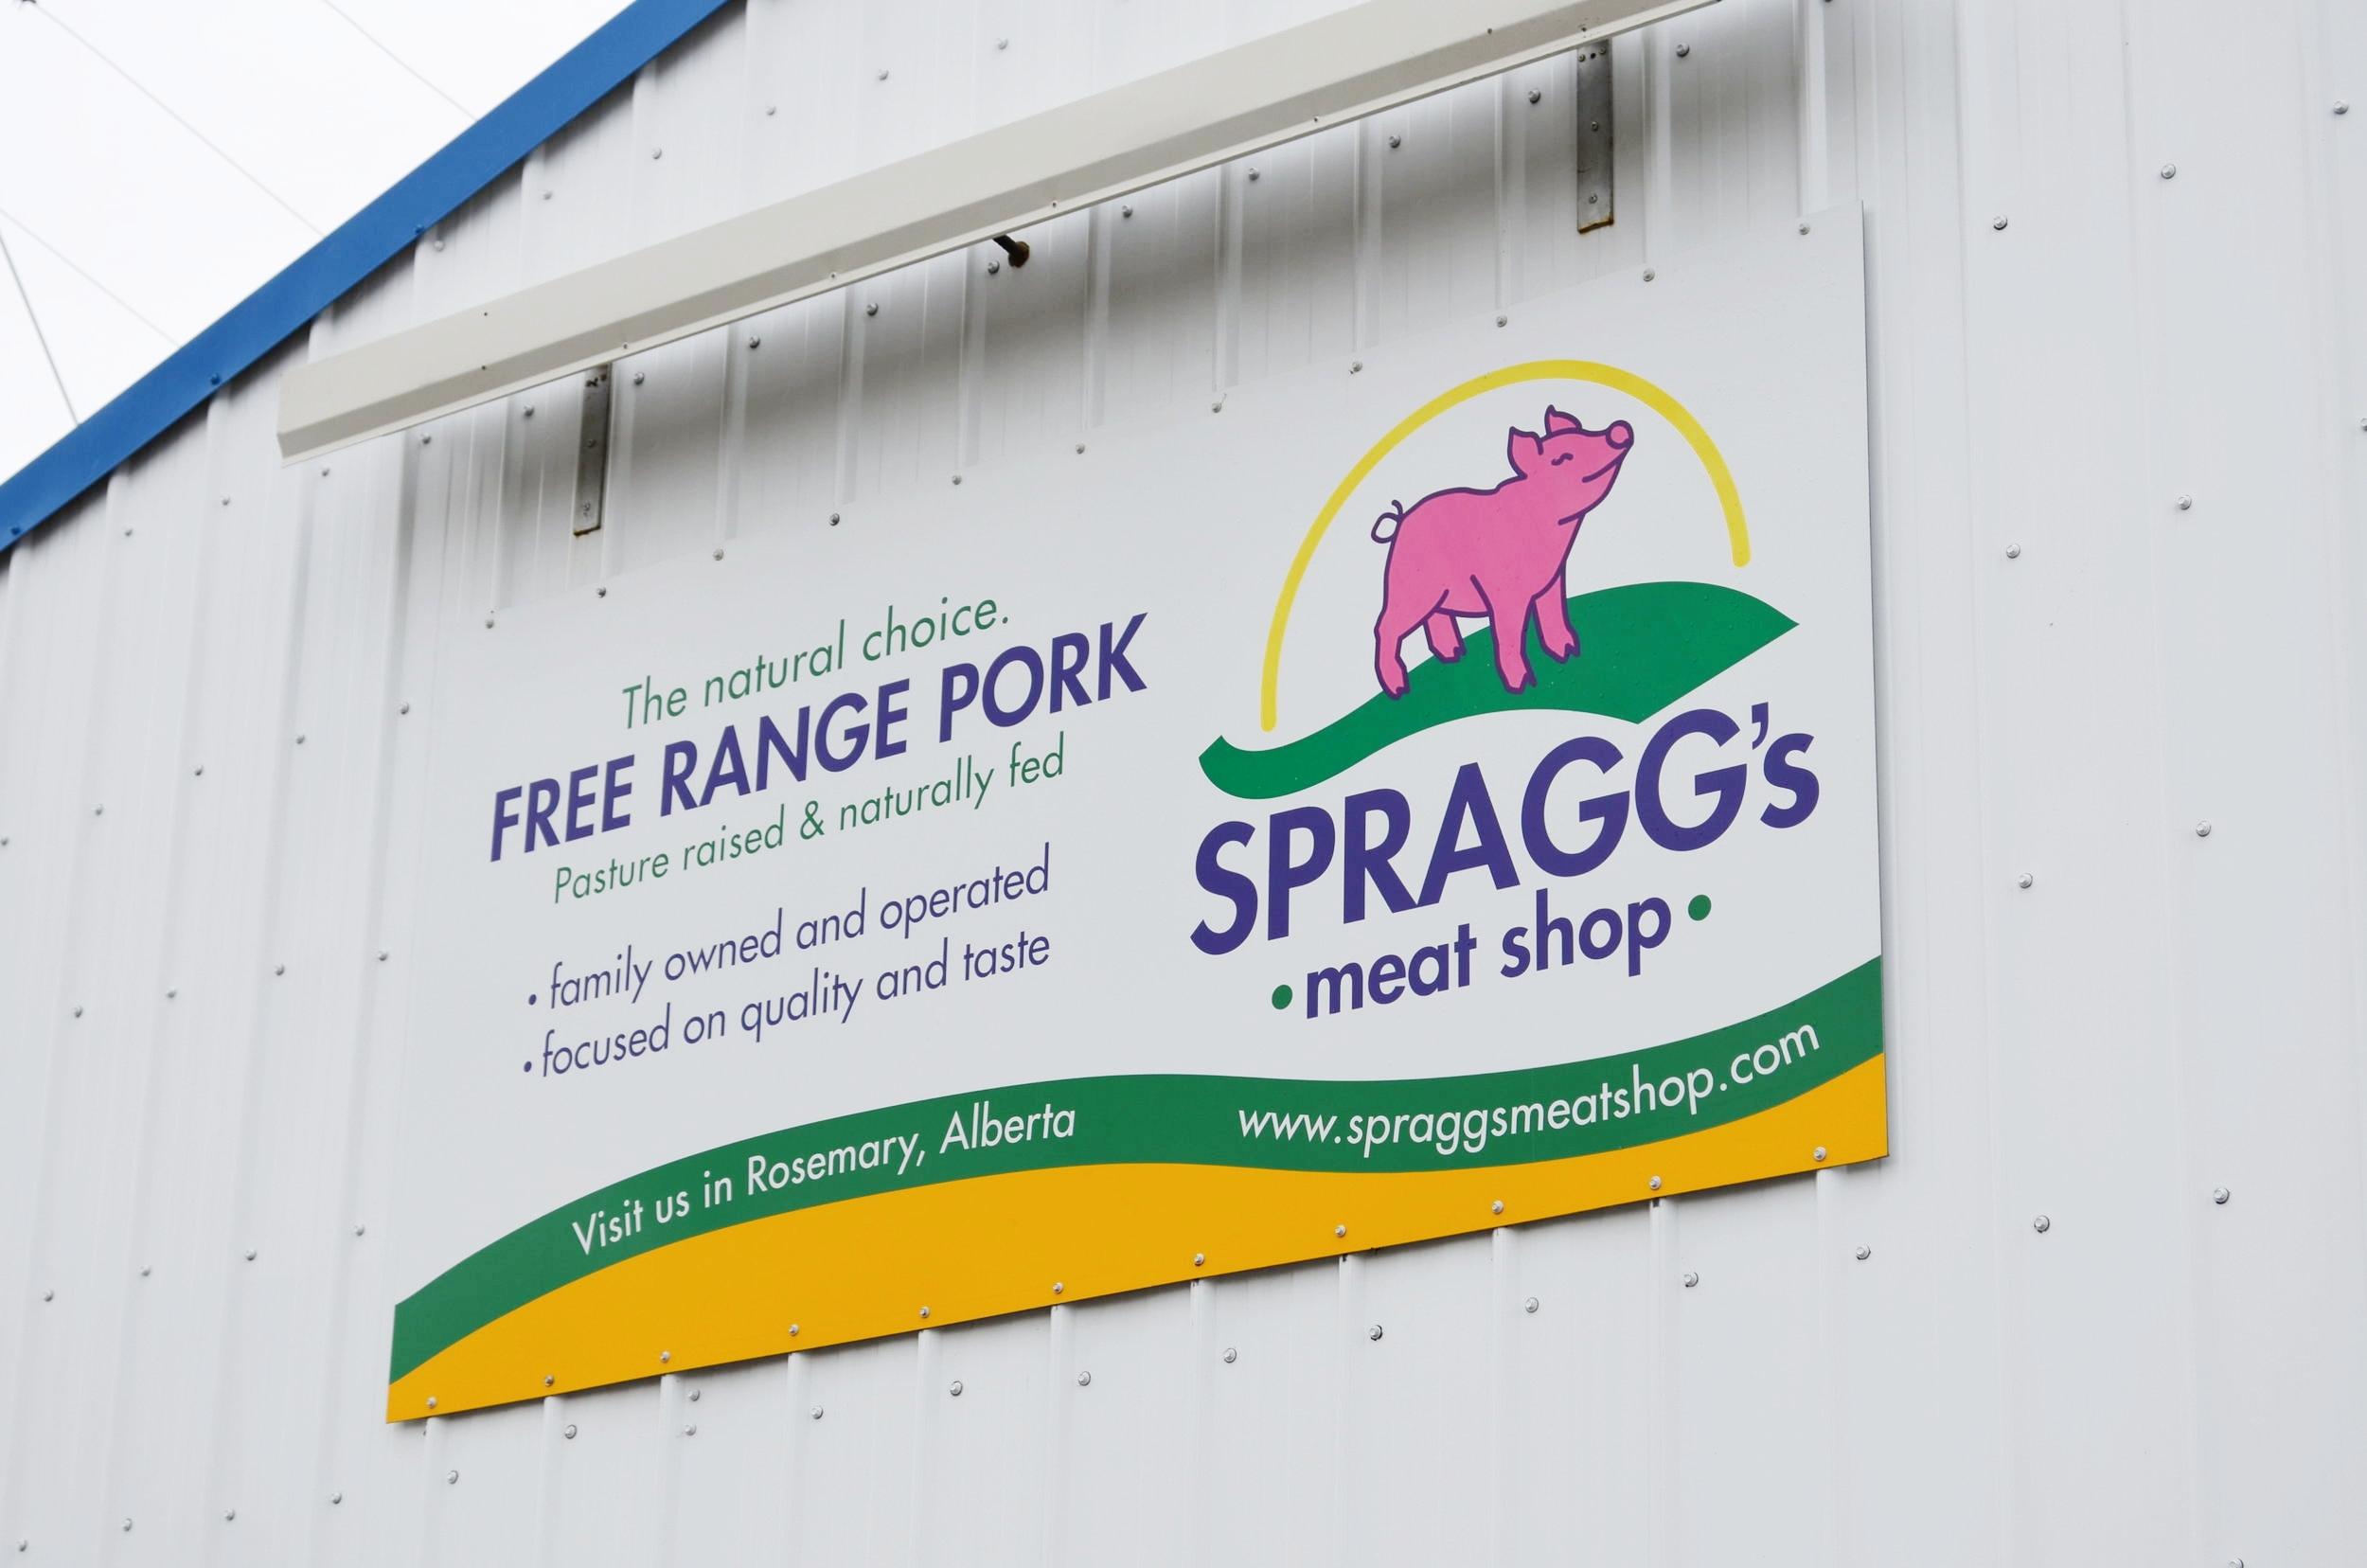 Spragg's Meat Shop Rosemary .JPG